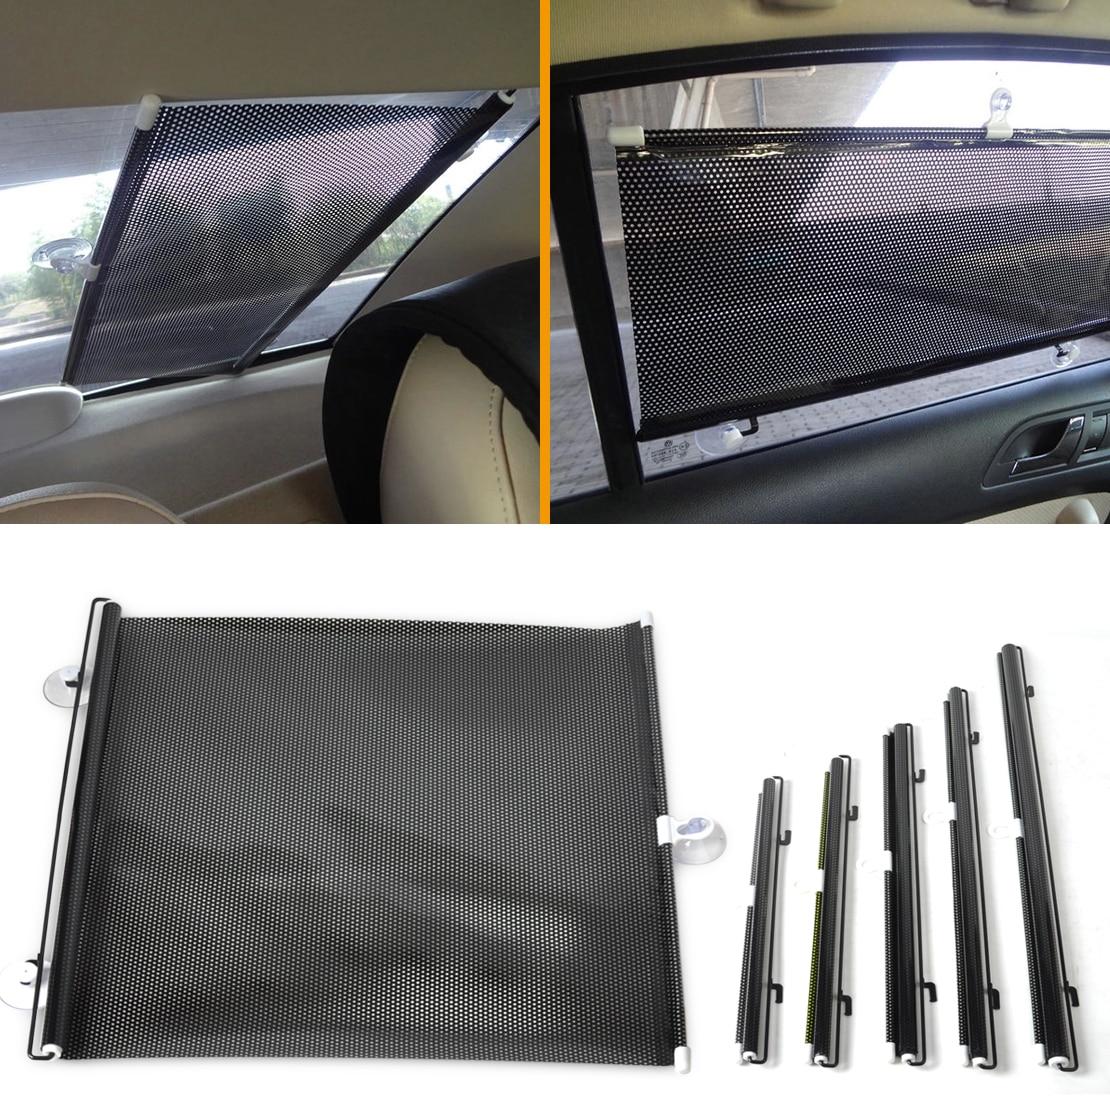 CITALL 68 x125cm Car side Retractable Windshield Window Sunshield Visor Sun Shade Curtain FOR VW Ford